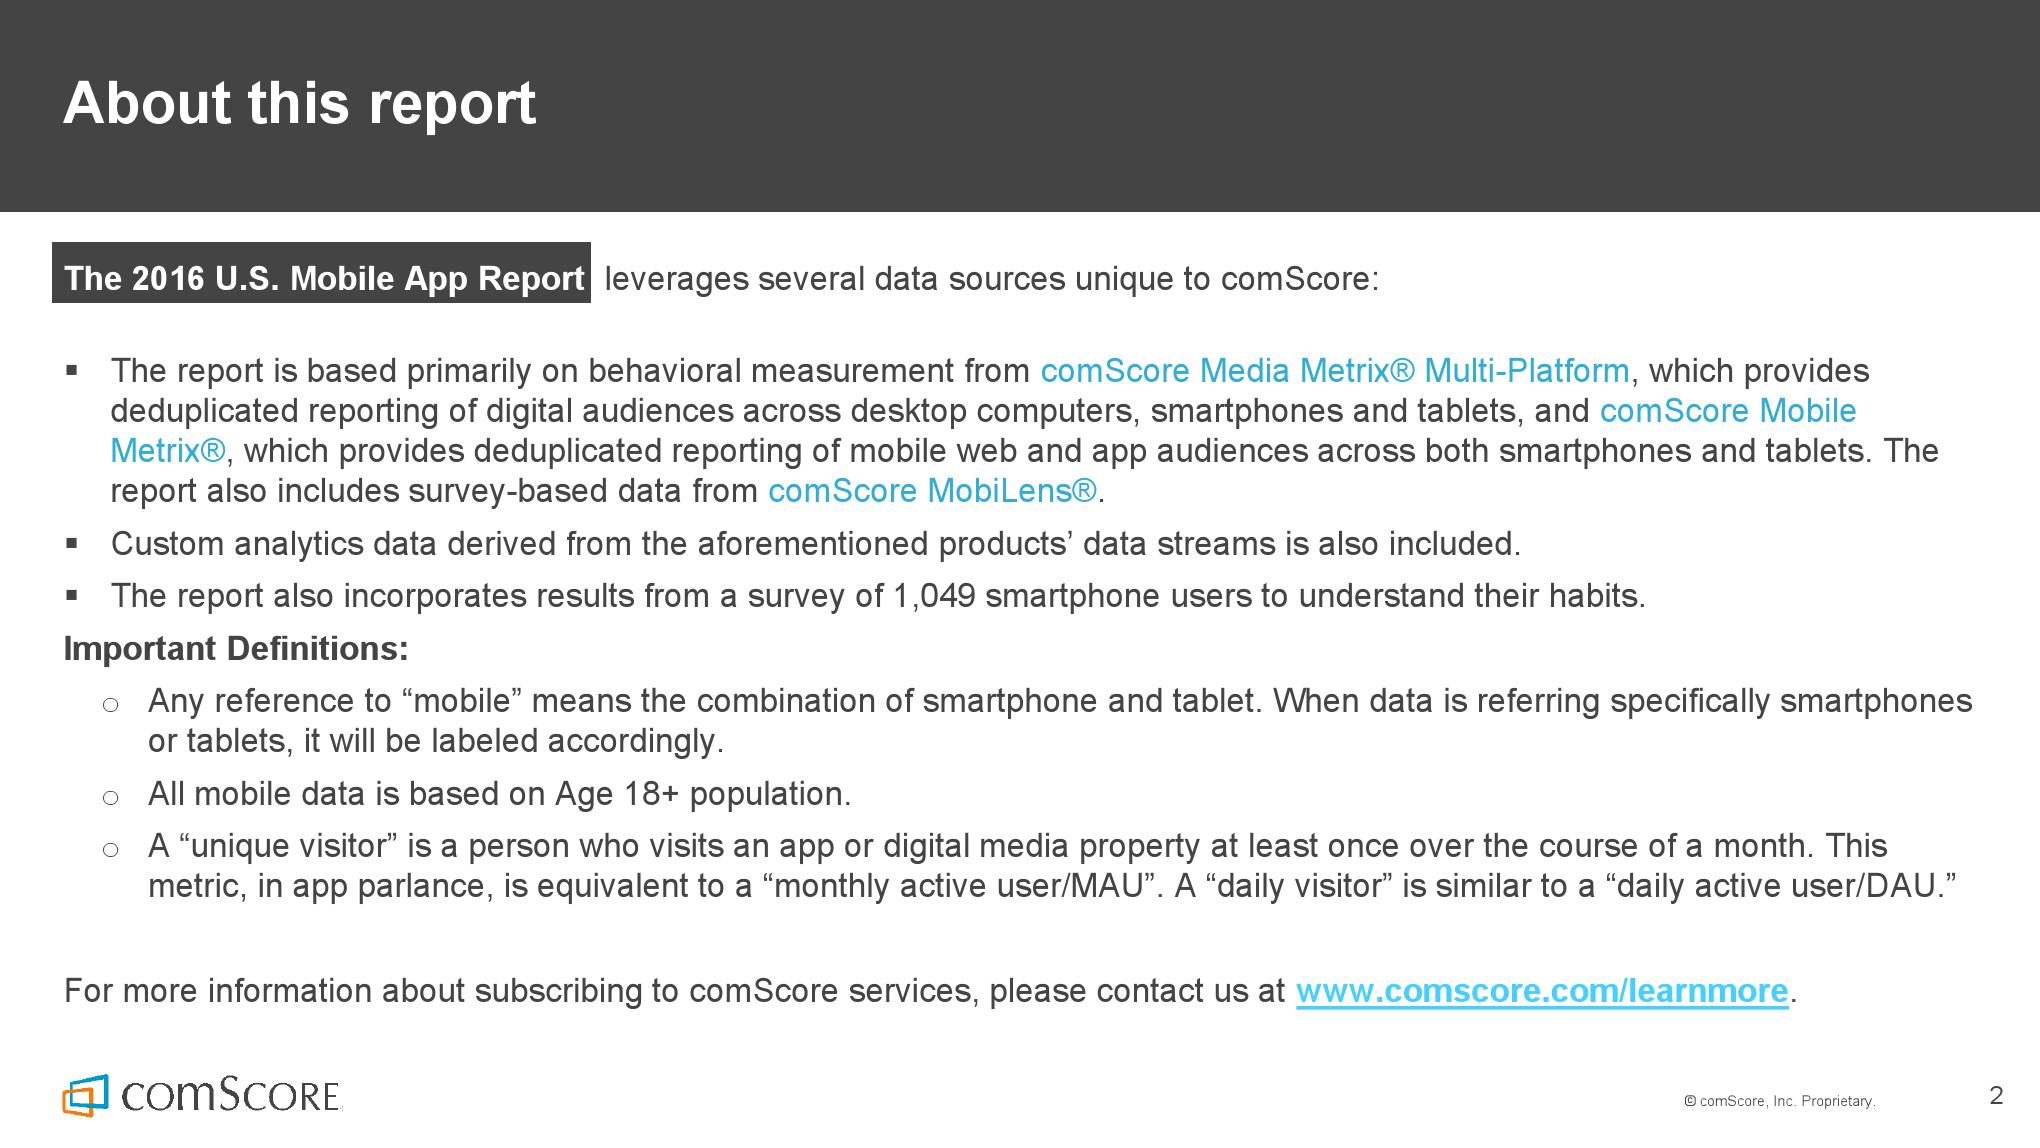 2016_US_Mobile_App_Report_000002